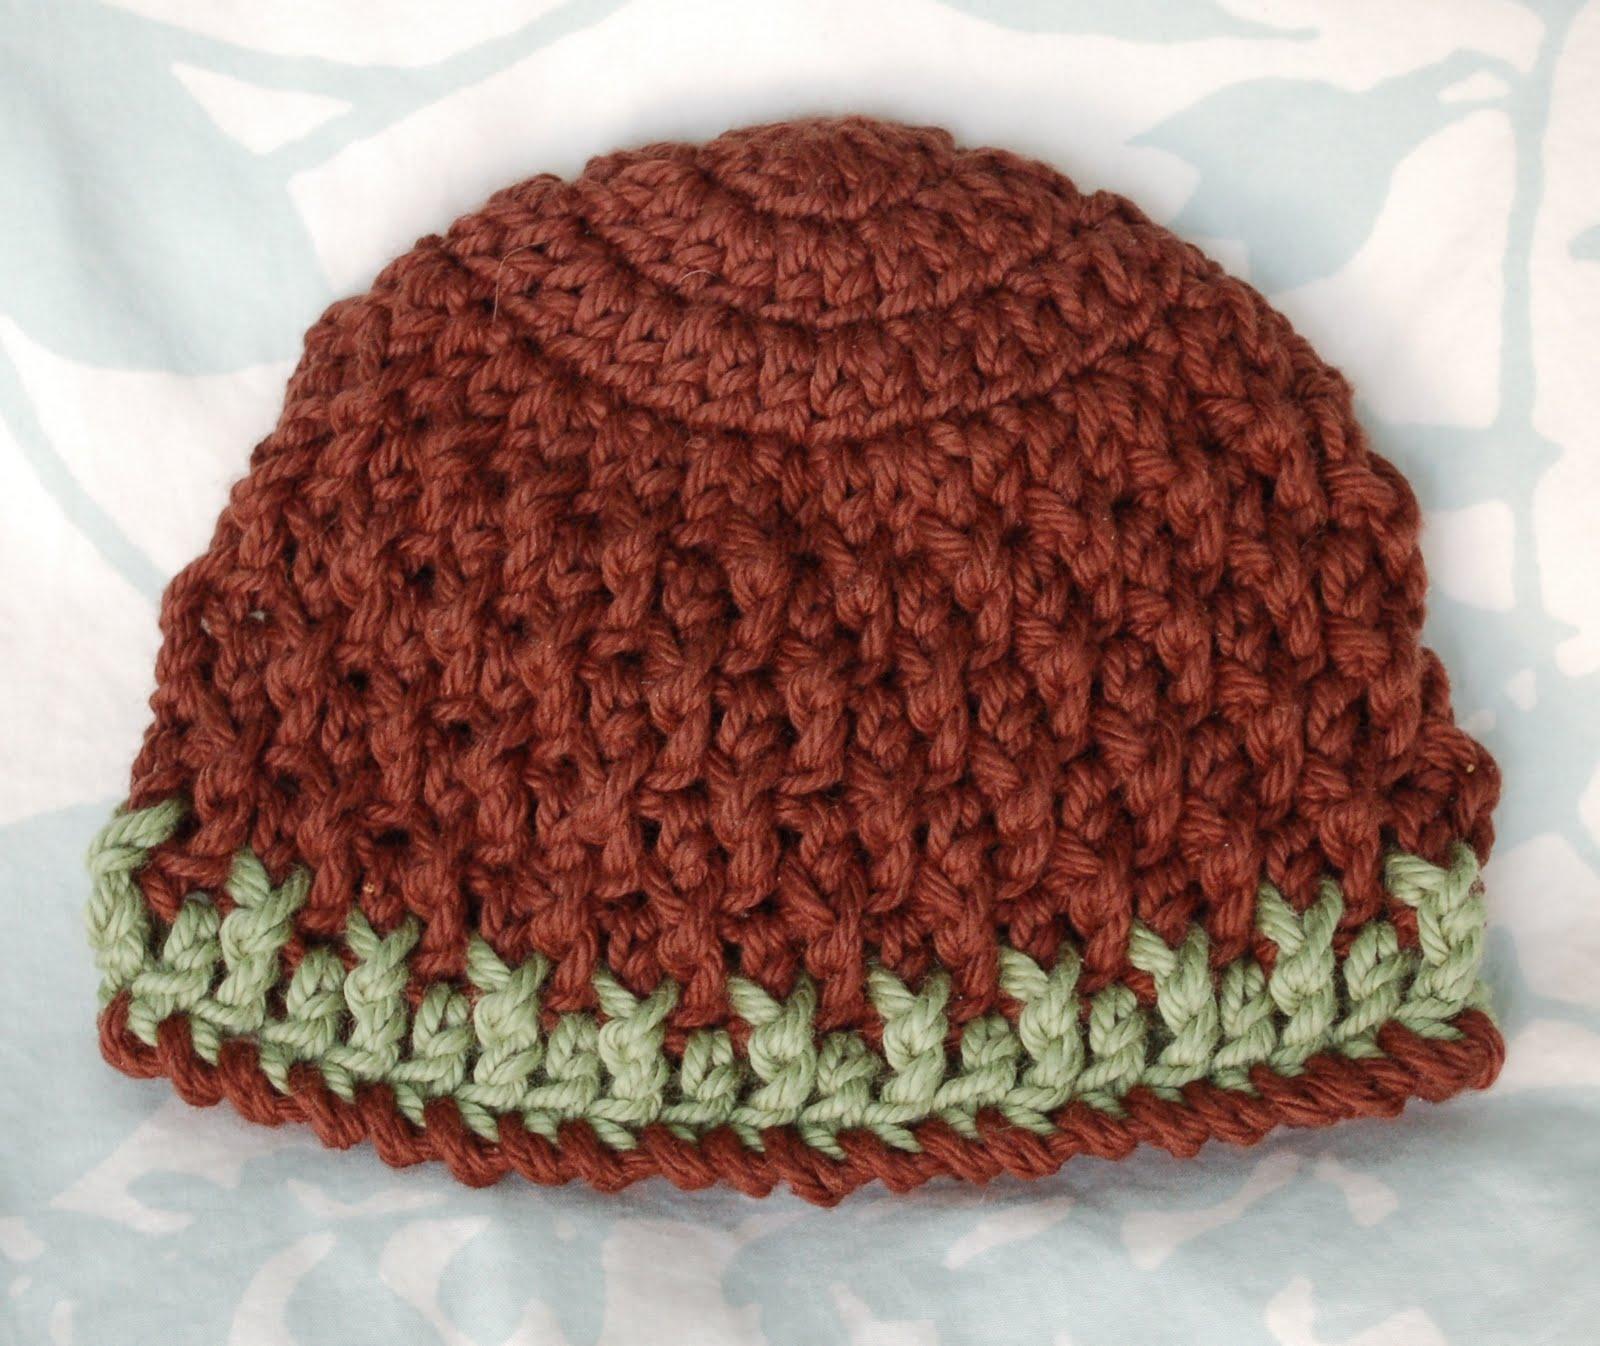 Alli Crafts  Free Pattern  Deeply Textured Hat - Newborn 8d000dd5790